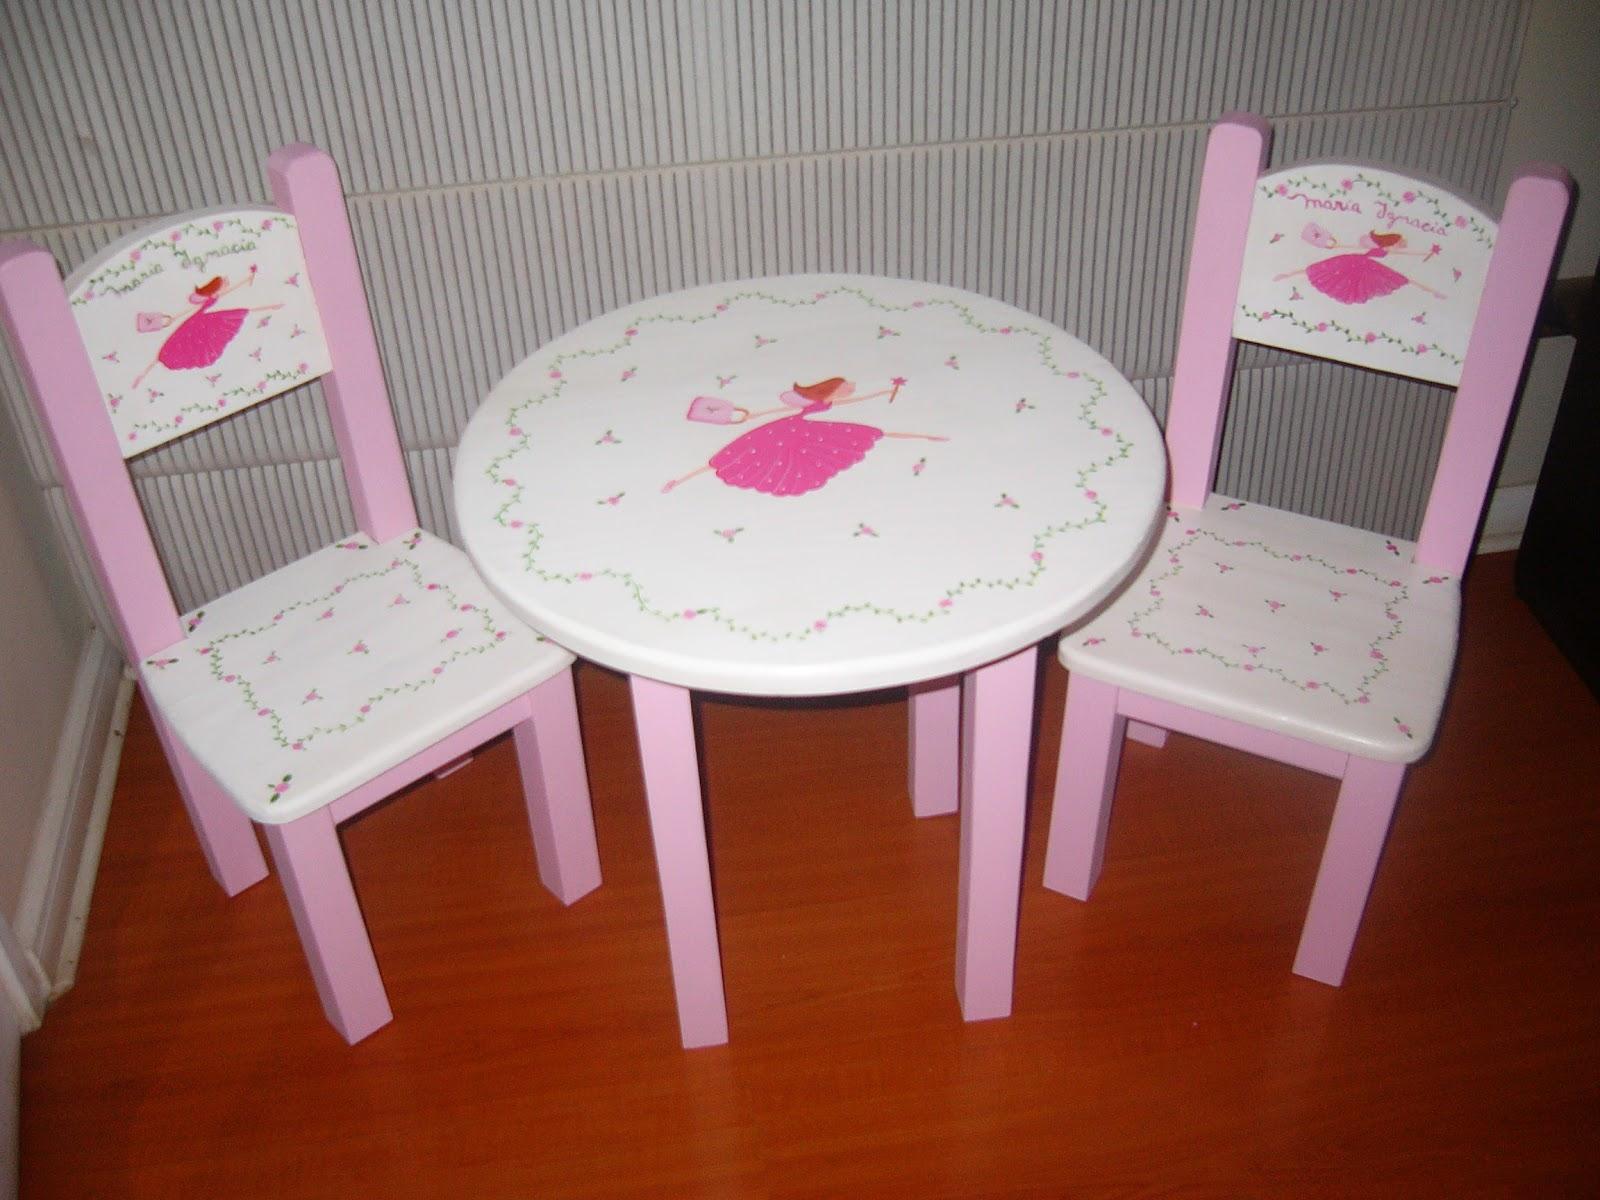 Mesas y sillas de madera infantiles imagui - Mesas infantiles madera ...